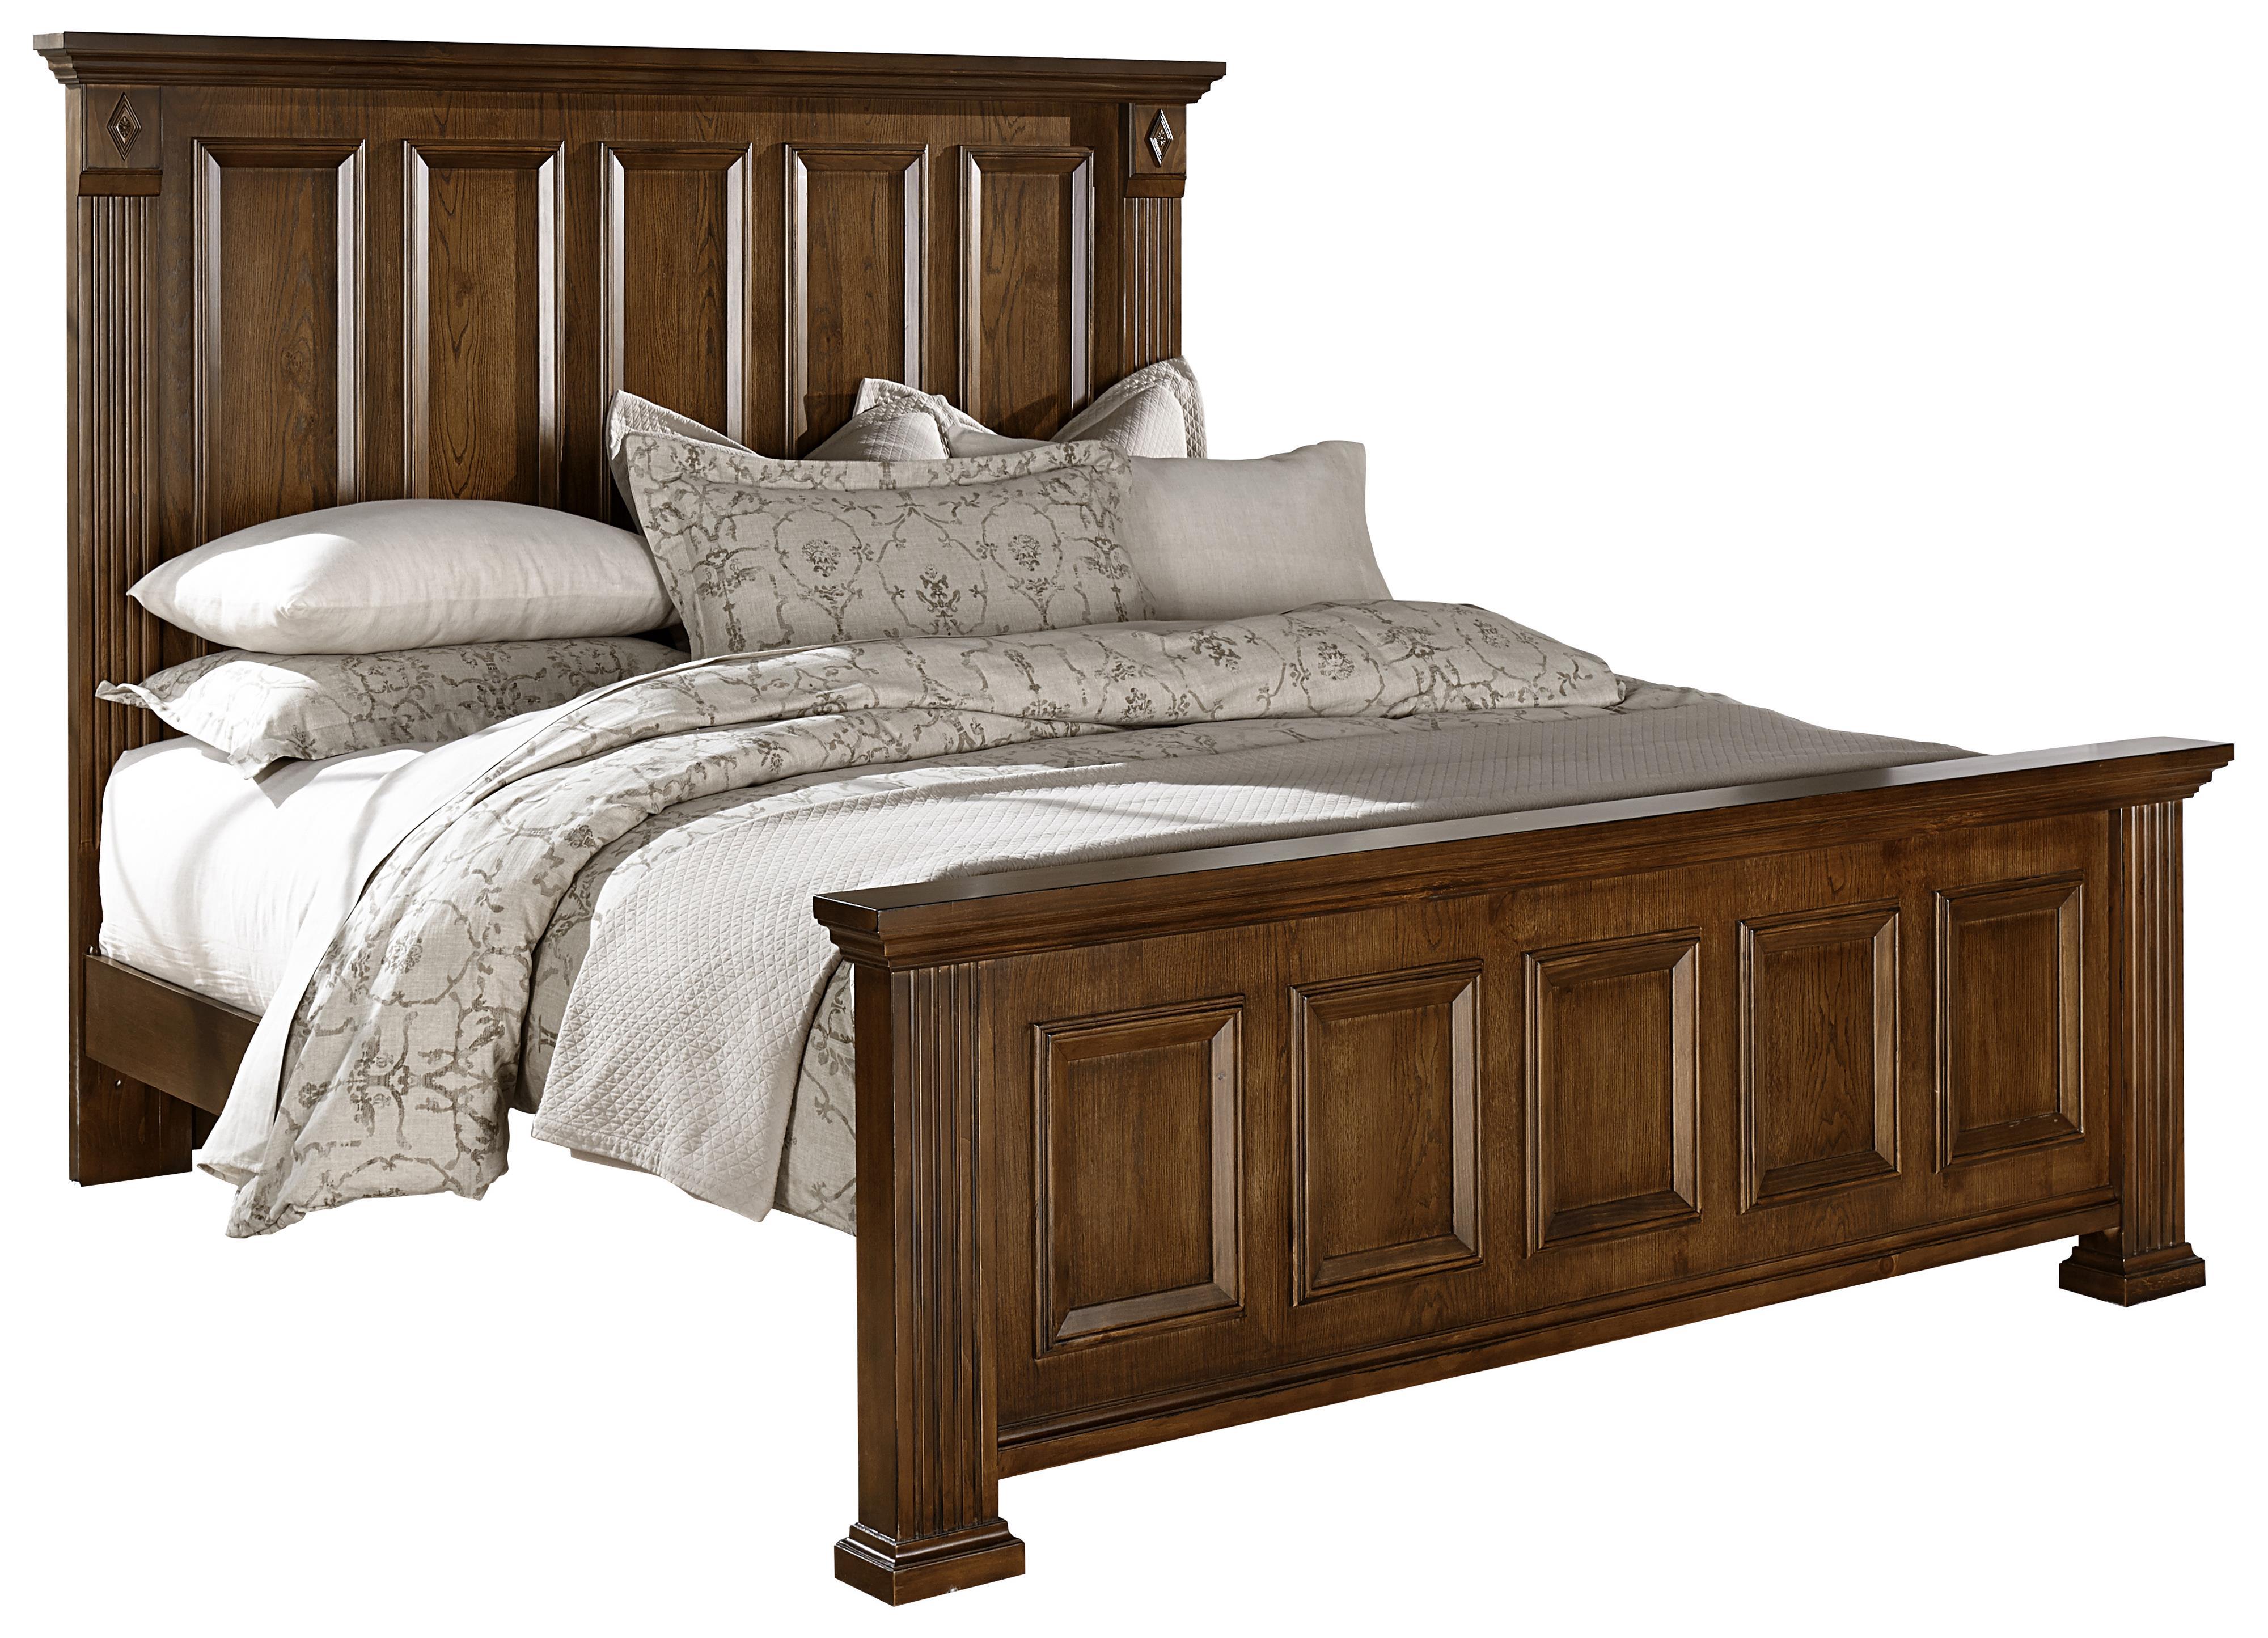 Vaughan bassett woodlands transitional queen mansion bed for Panel bed mattress